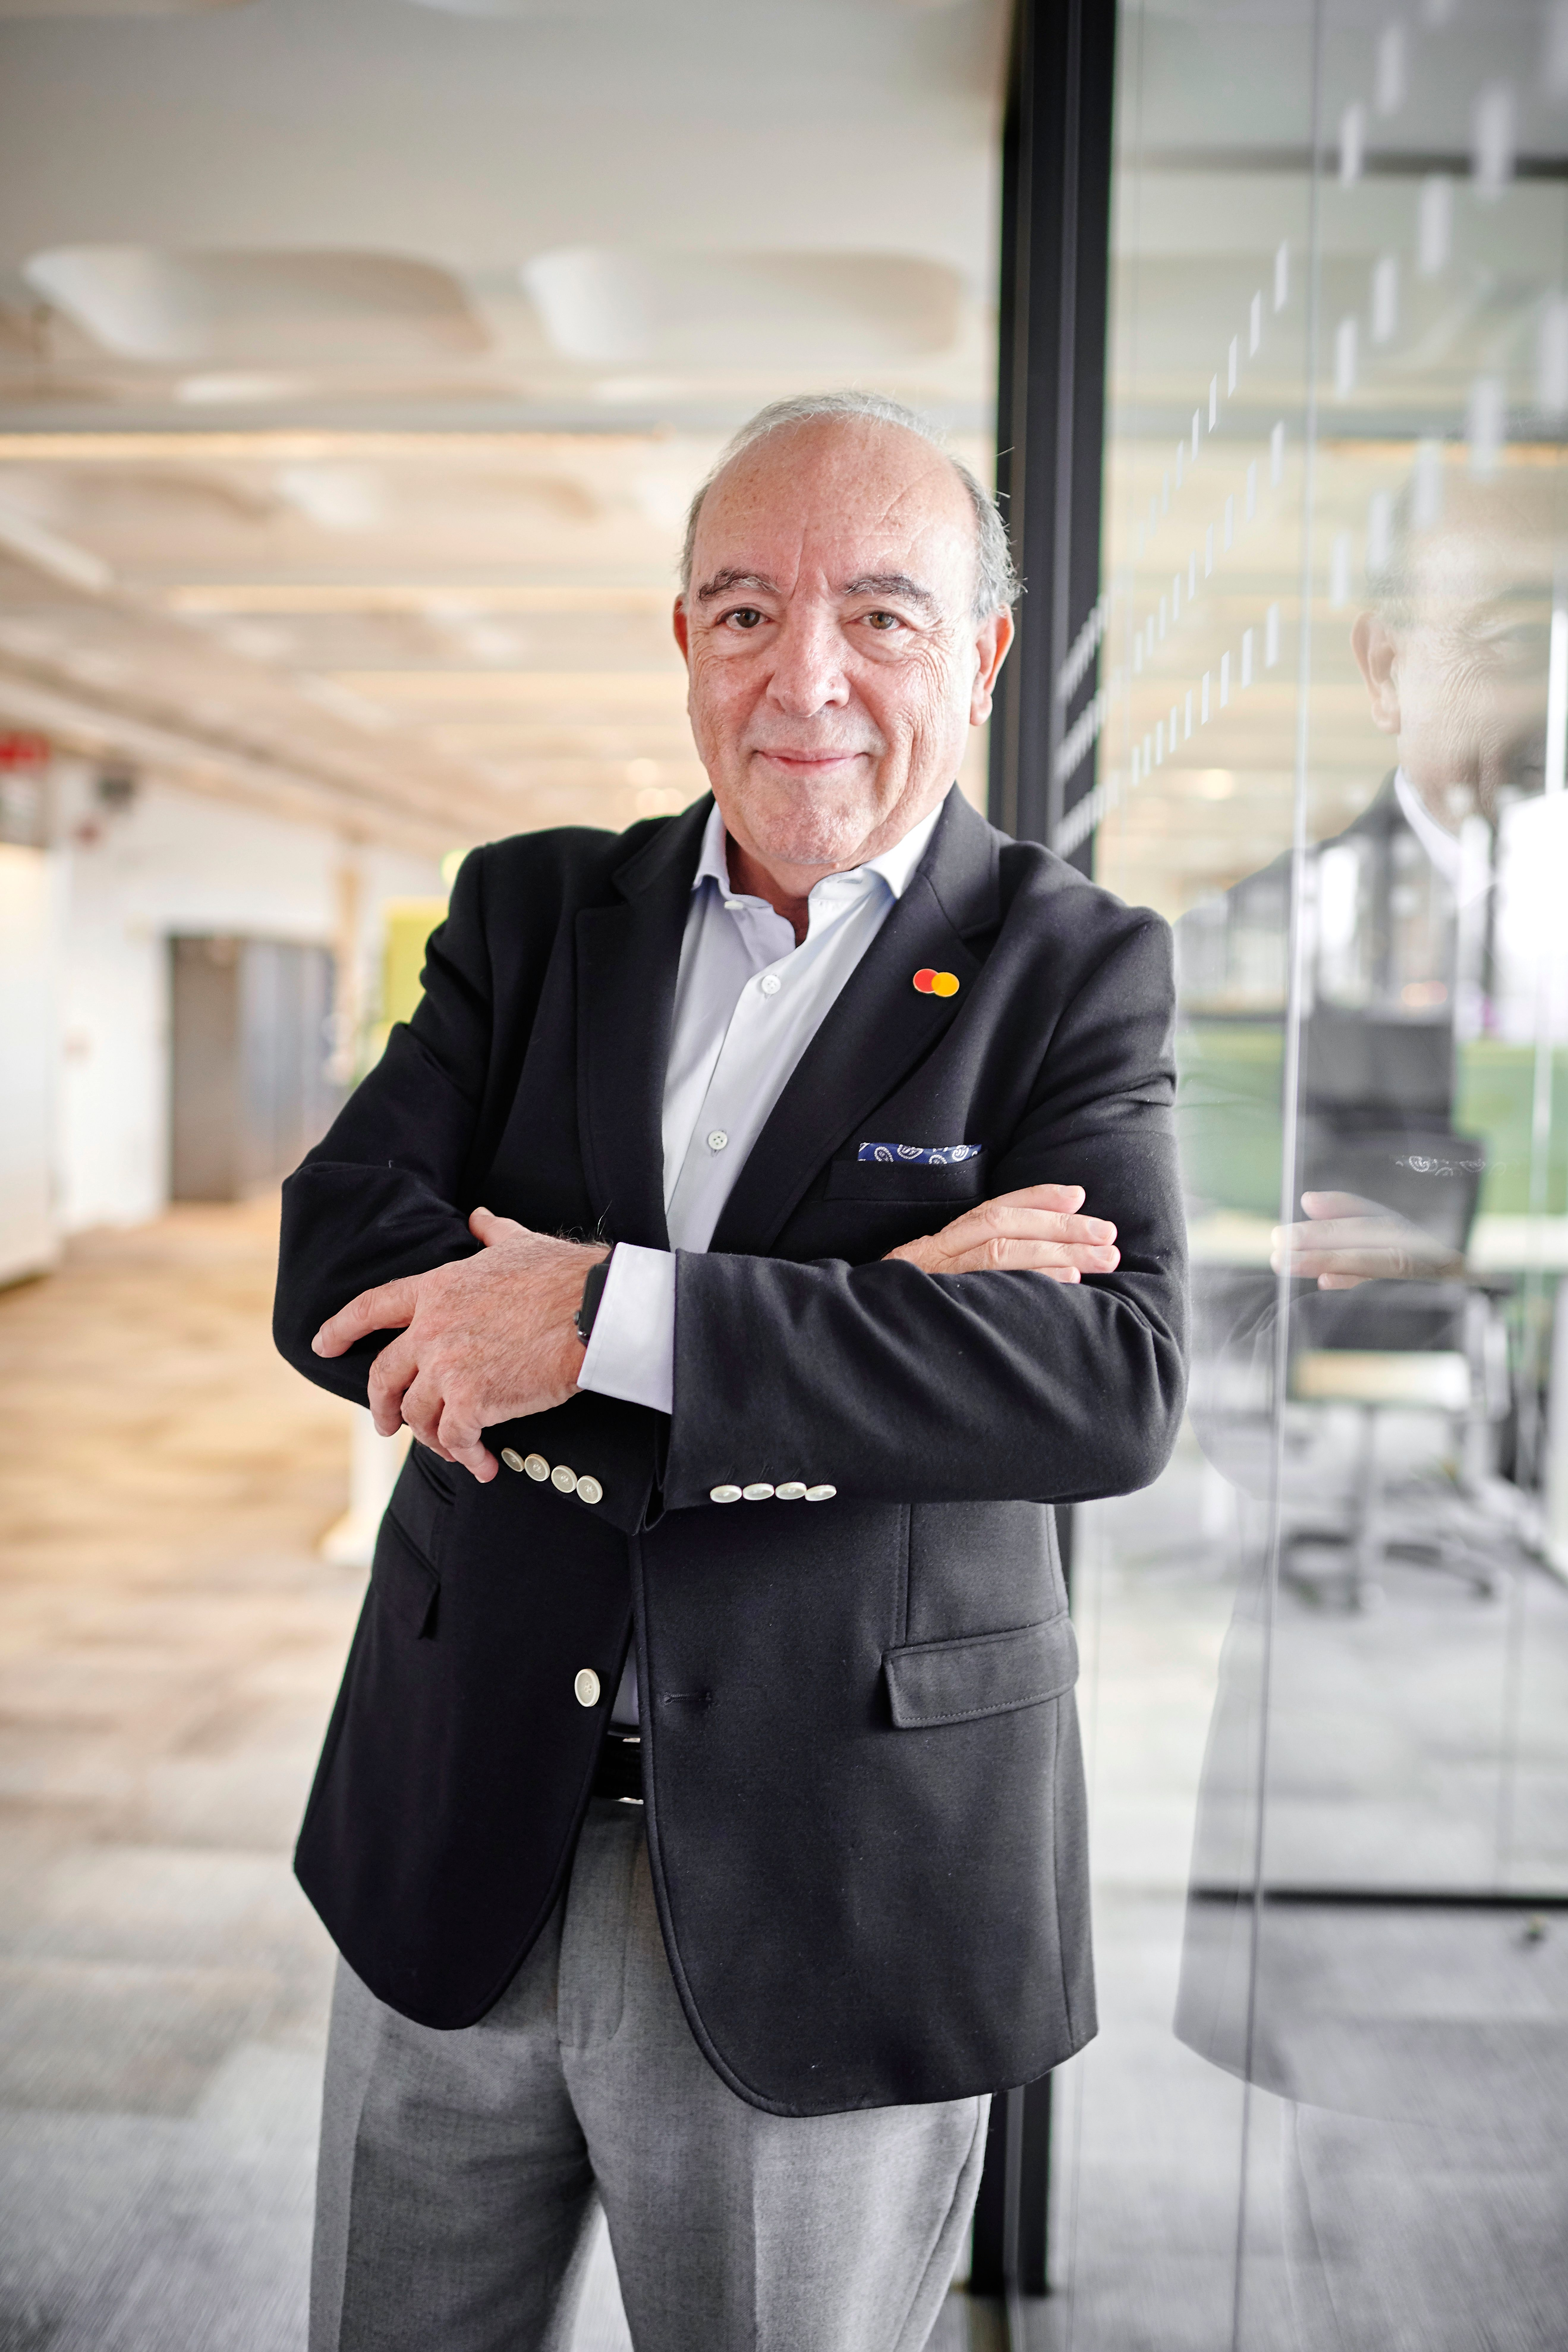 Javier Perez, President, Mastercard Europe